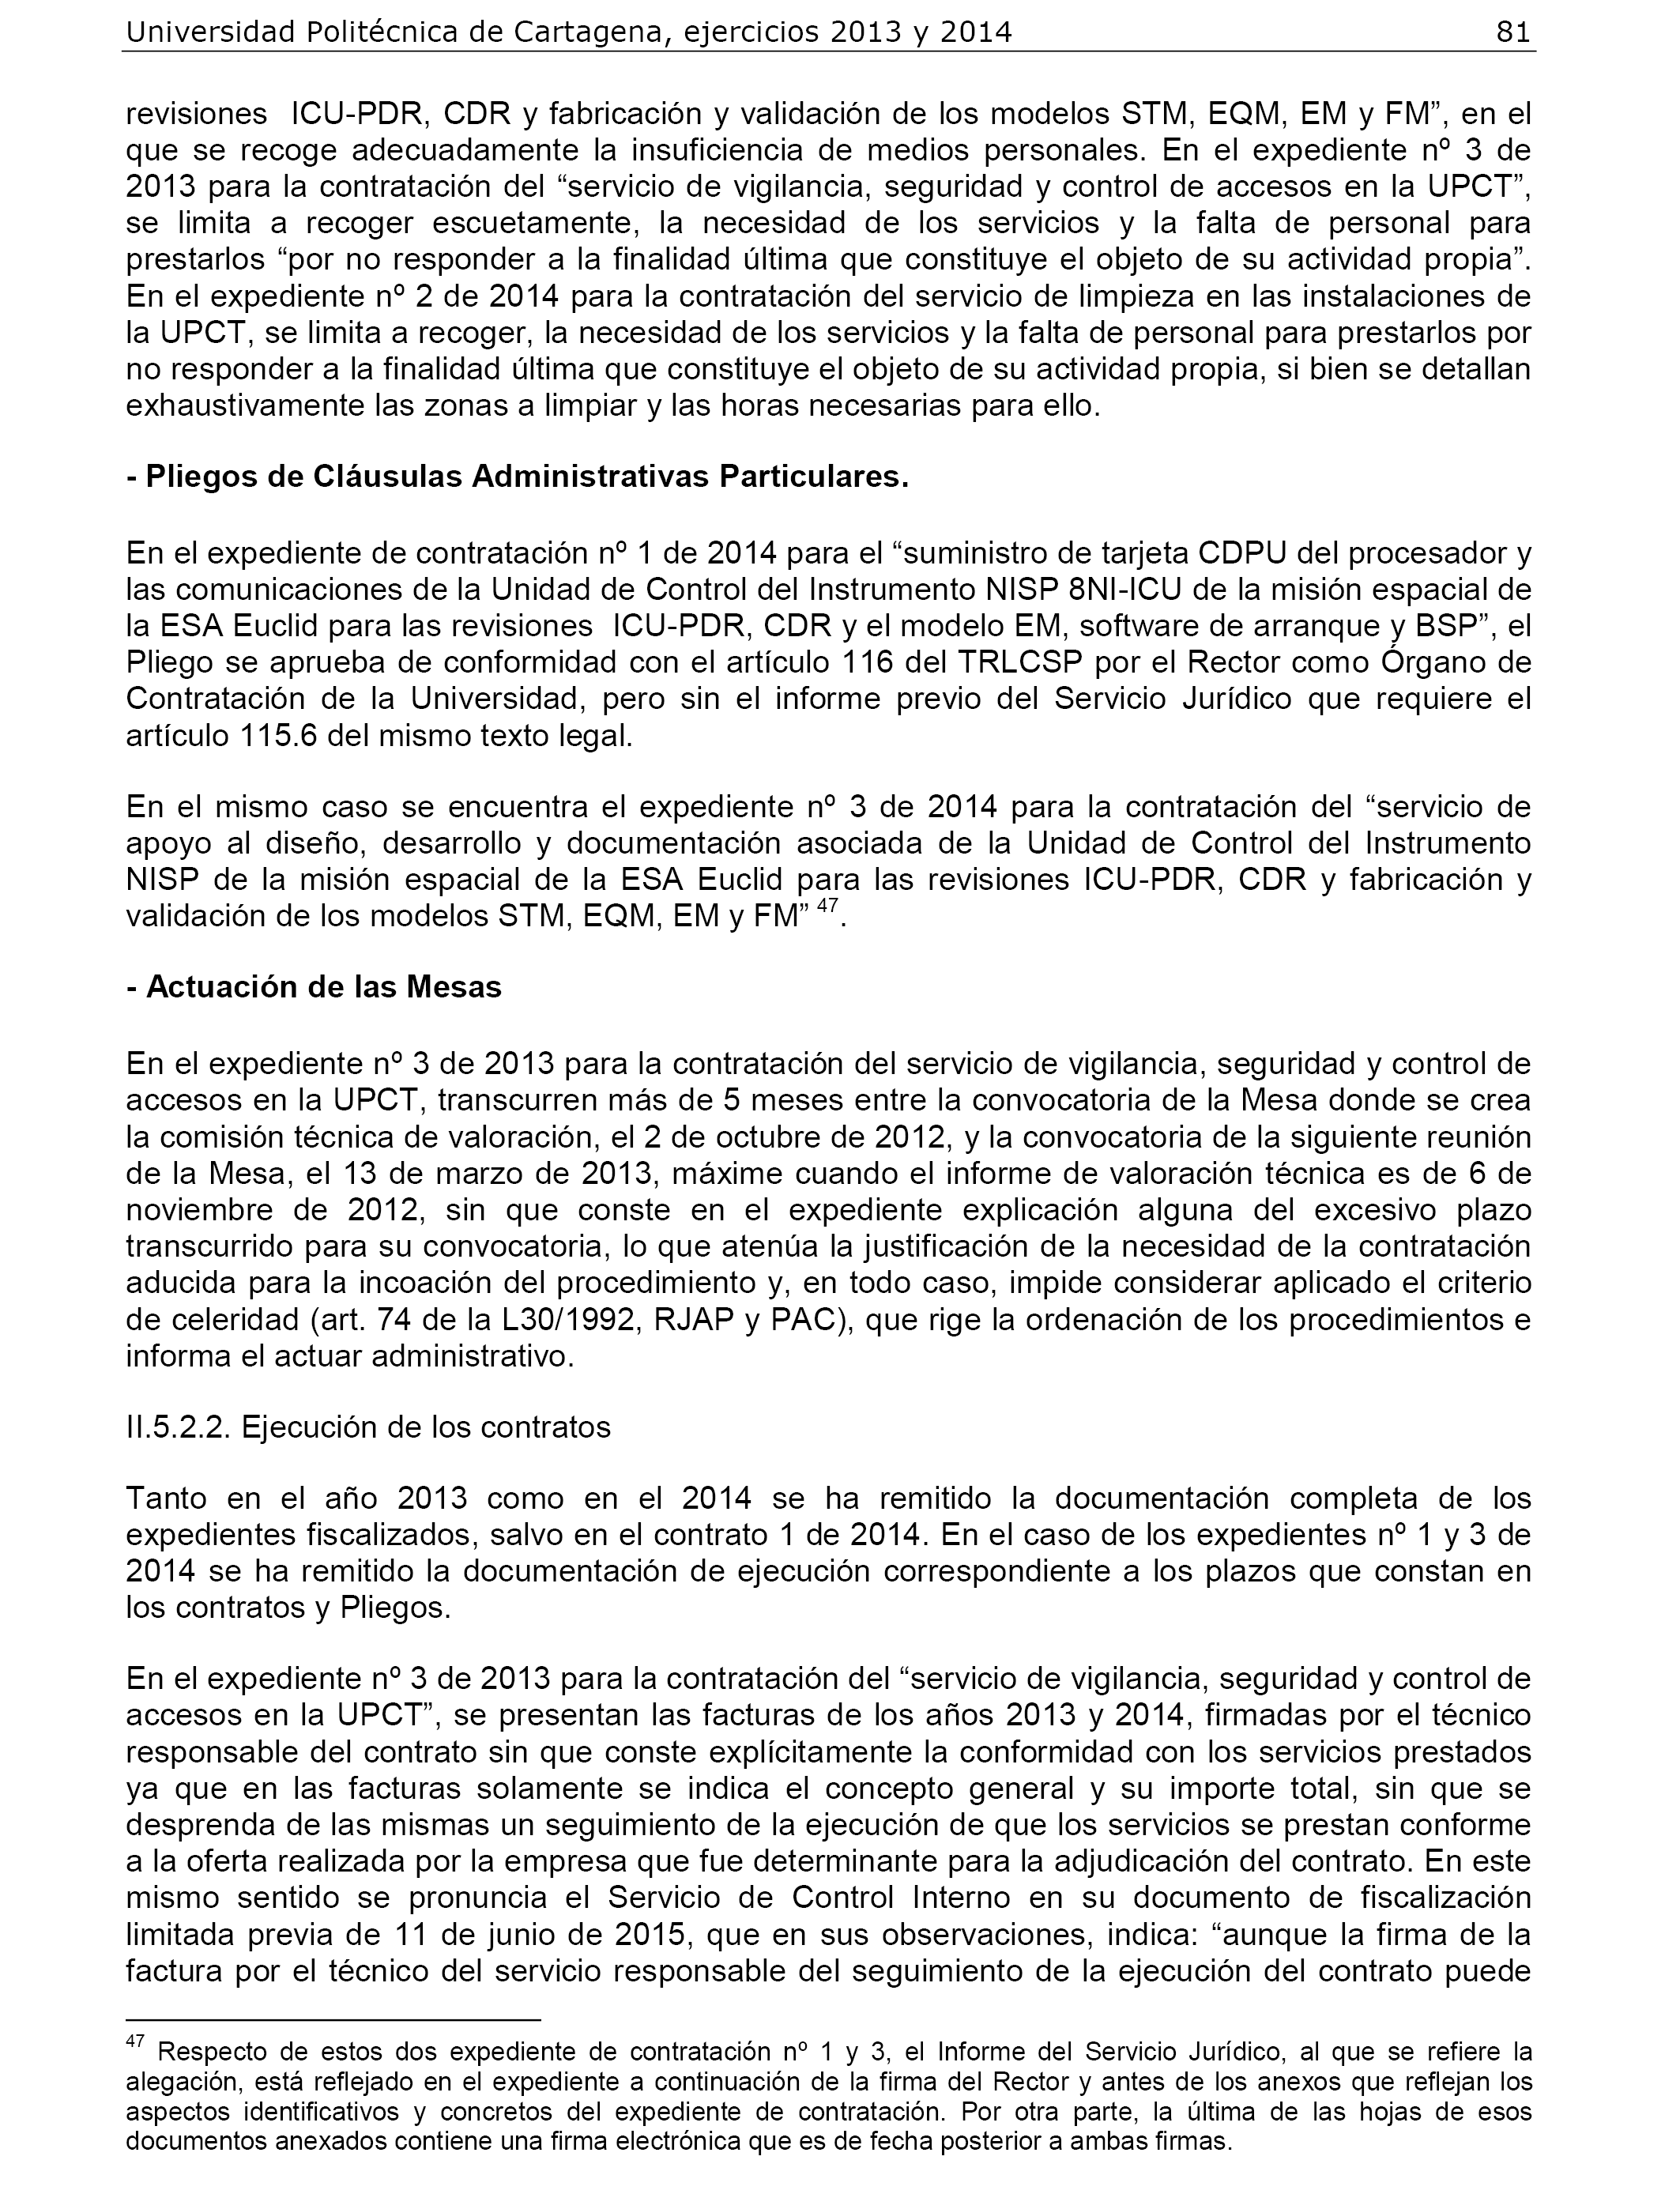 BOE.es - Documento BOE-A-2017-8788